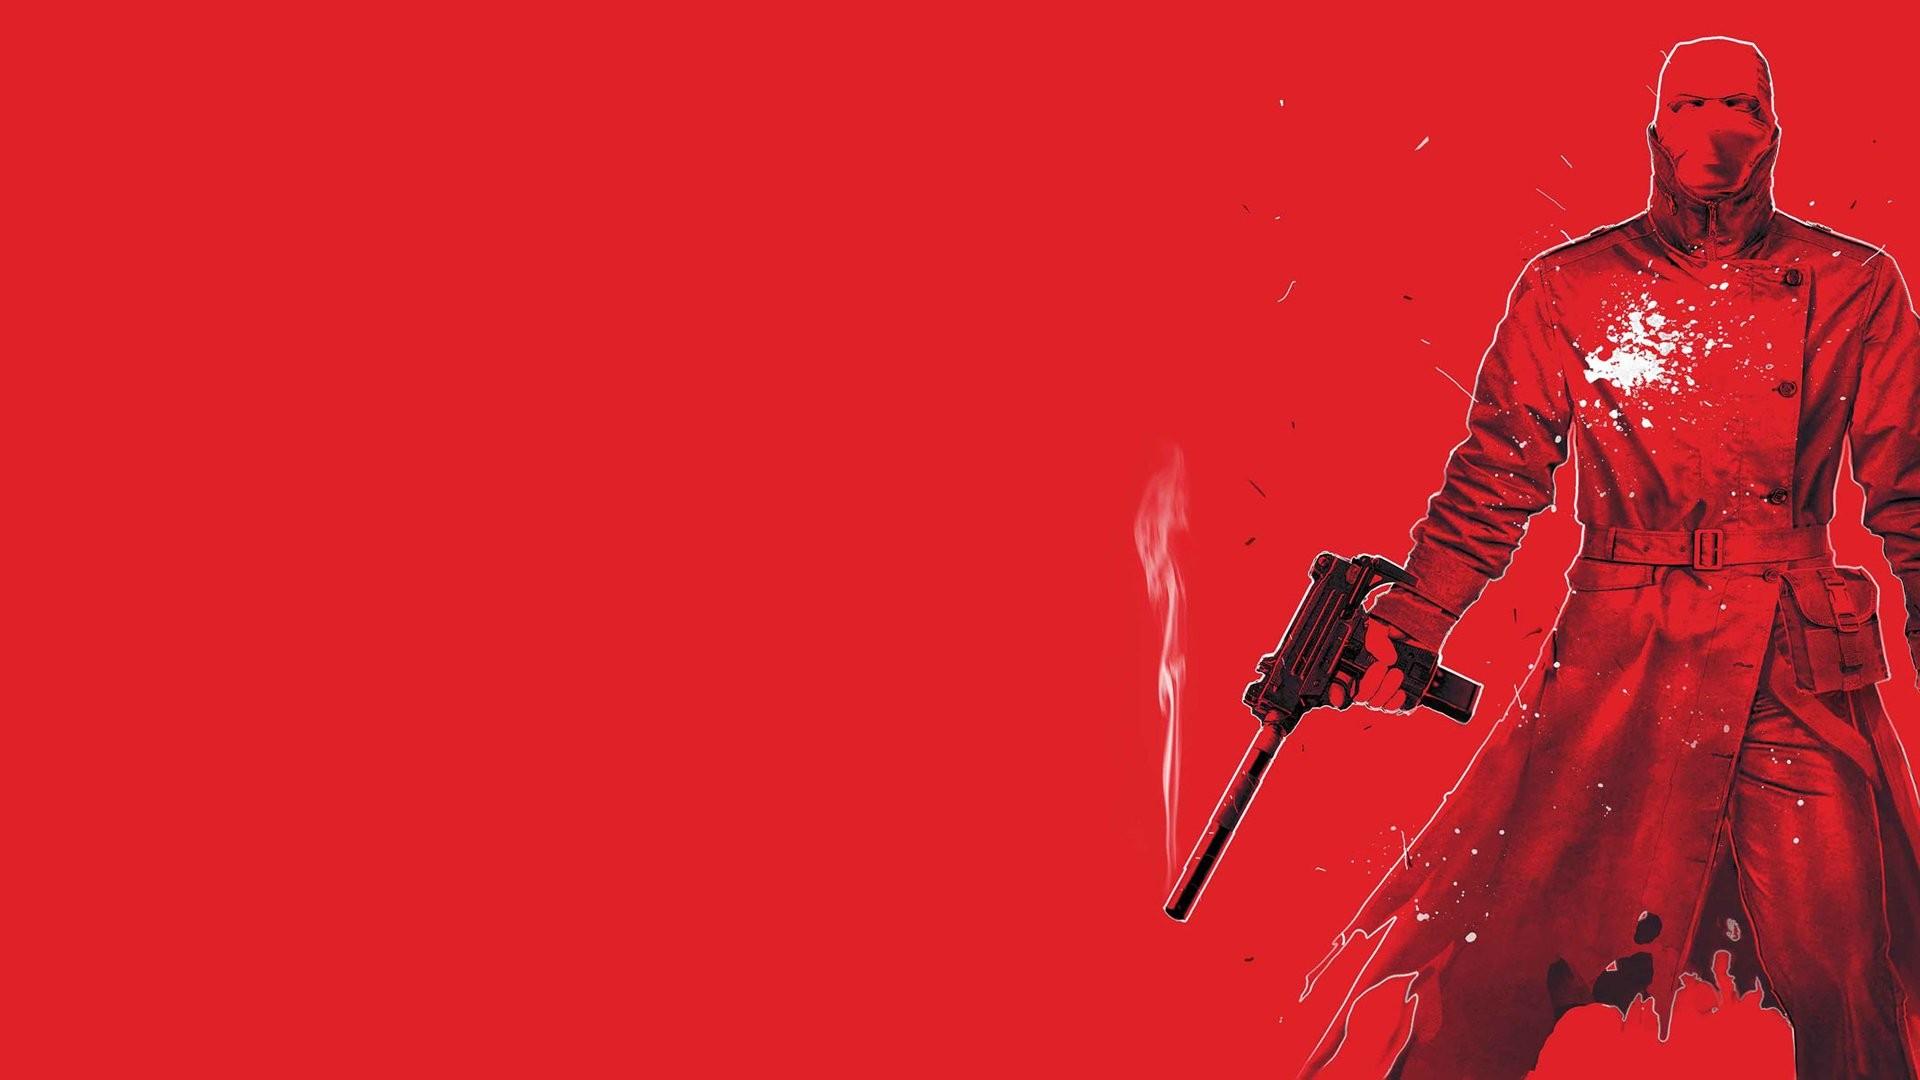 Red Hood wallpaper ·① Download free stunning HD wallpapers ...